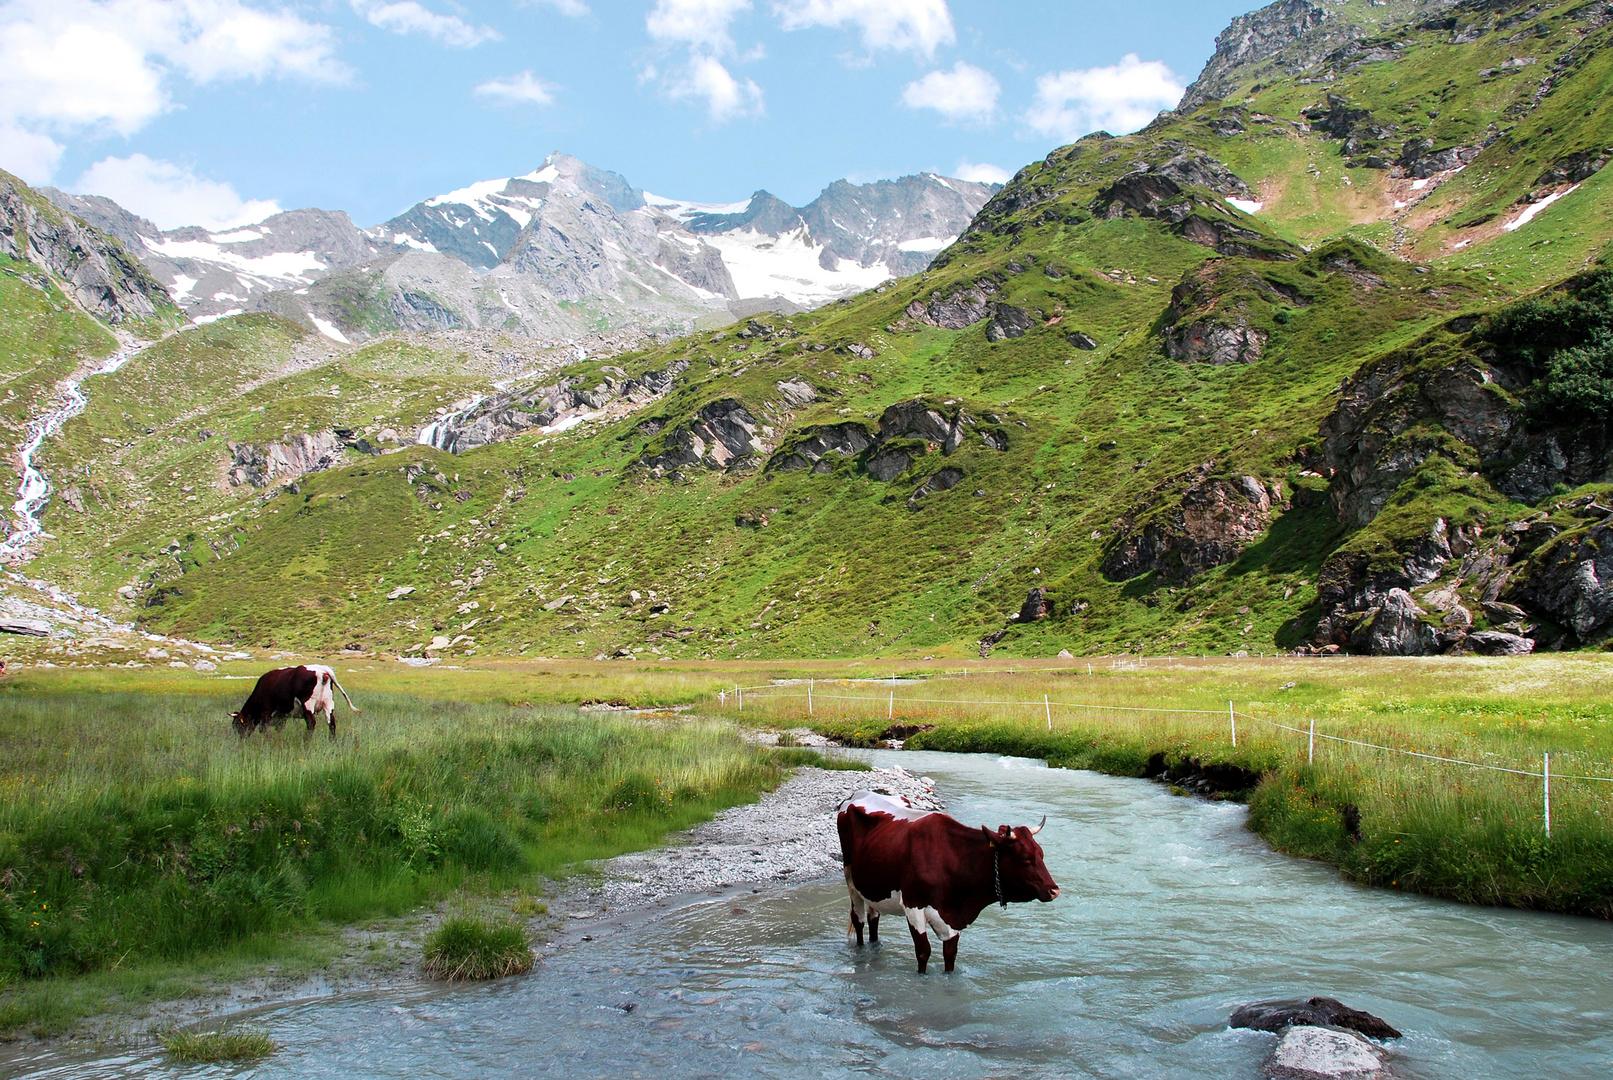 Montagne -.49 - Hot summer